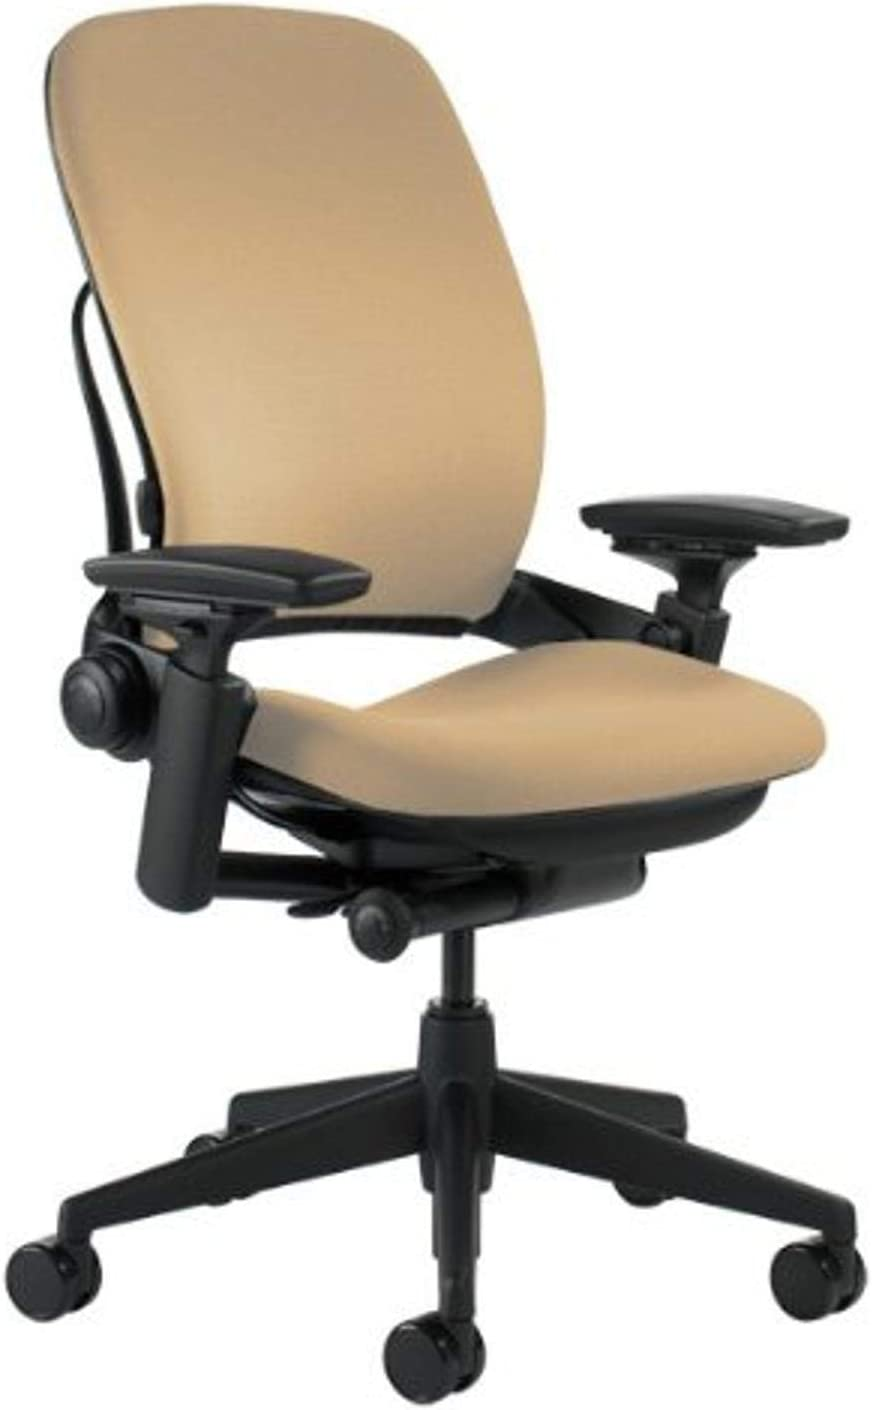 Steelcase Leap Chair, Barley Fabric -